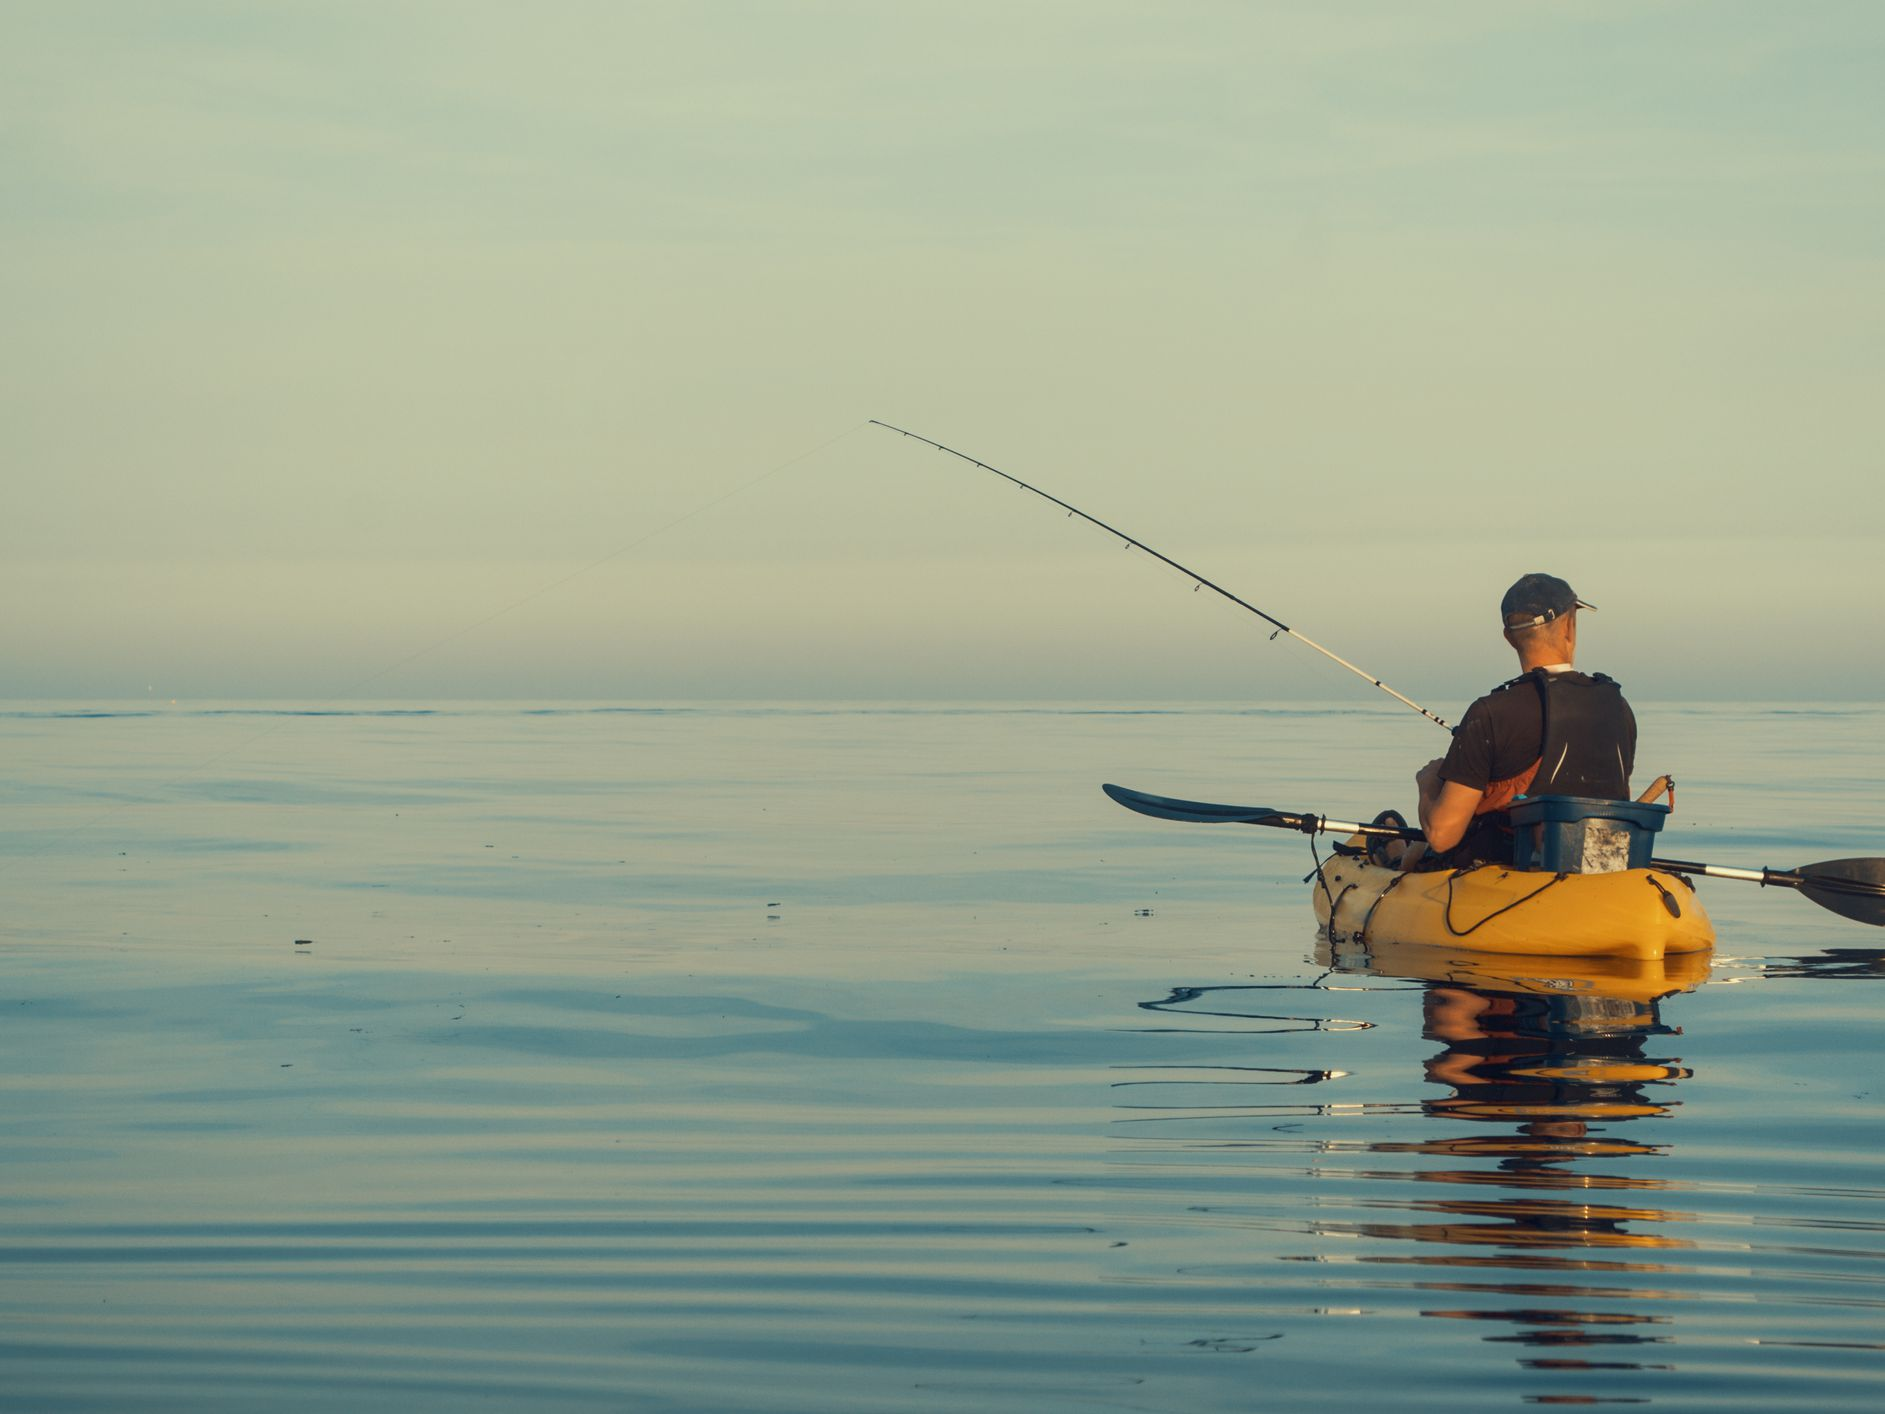 The 10 Best Fishing Kayaks of 2019